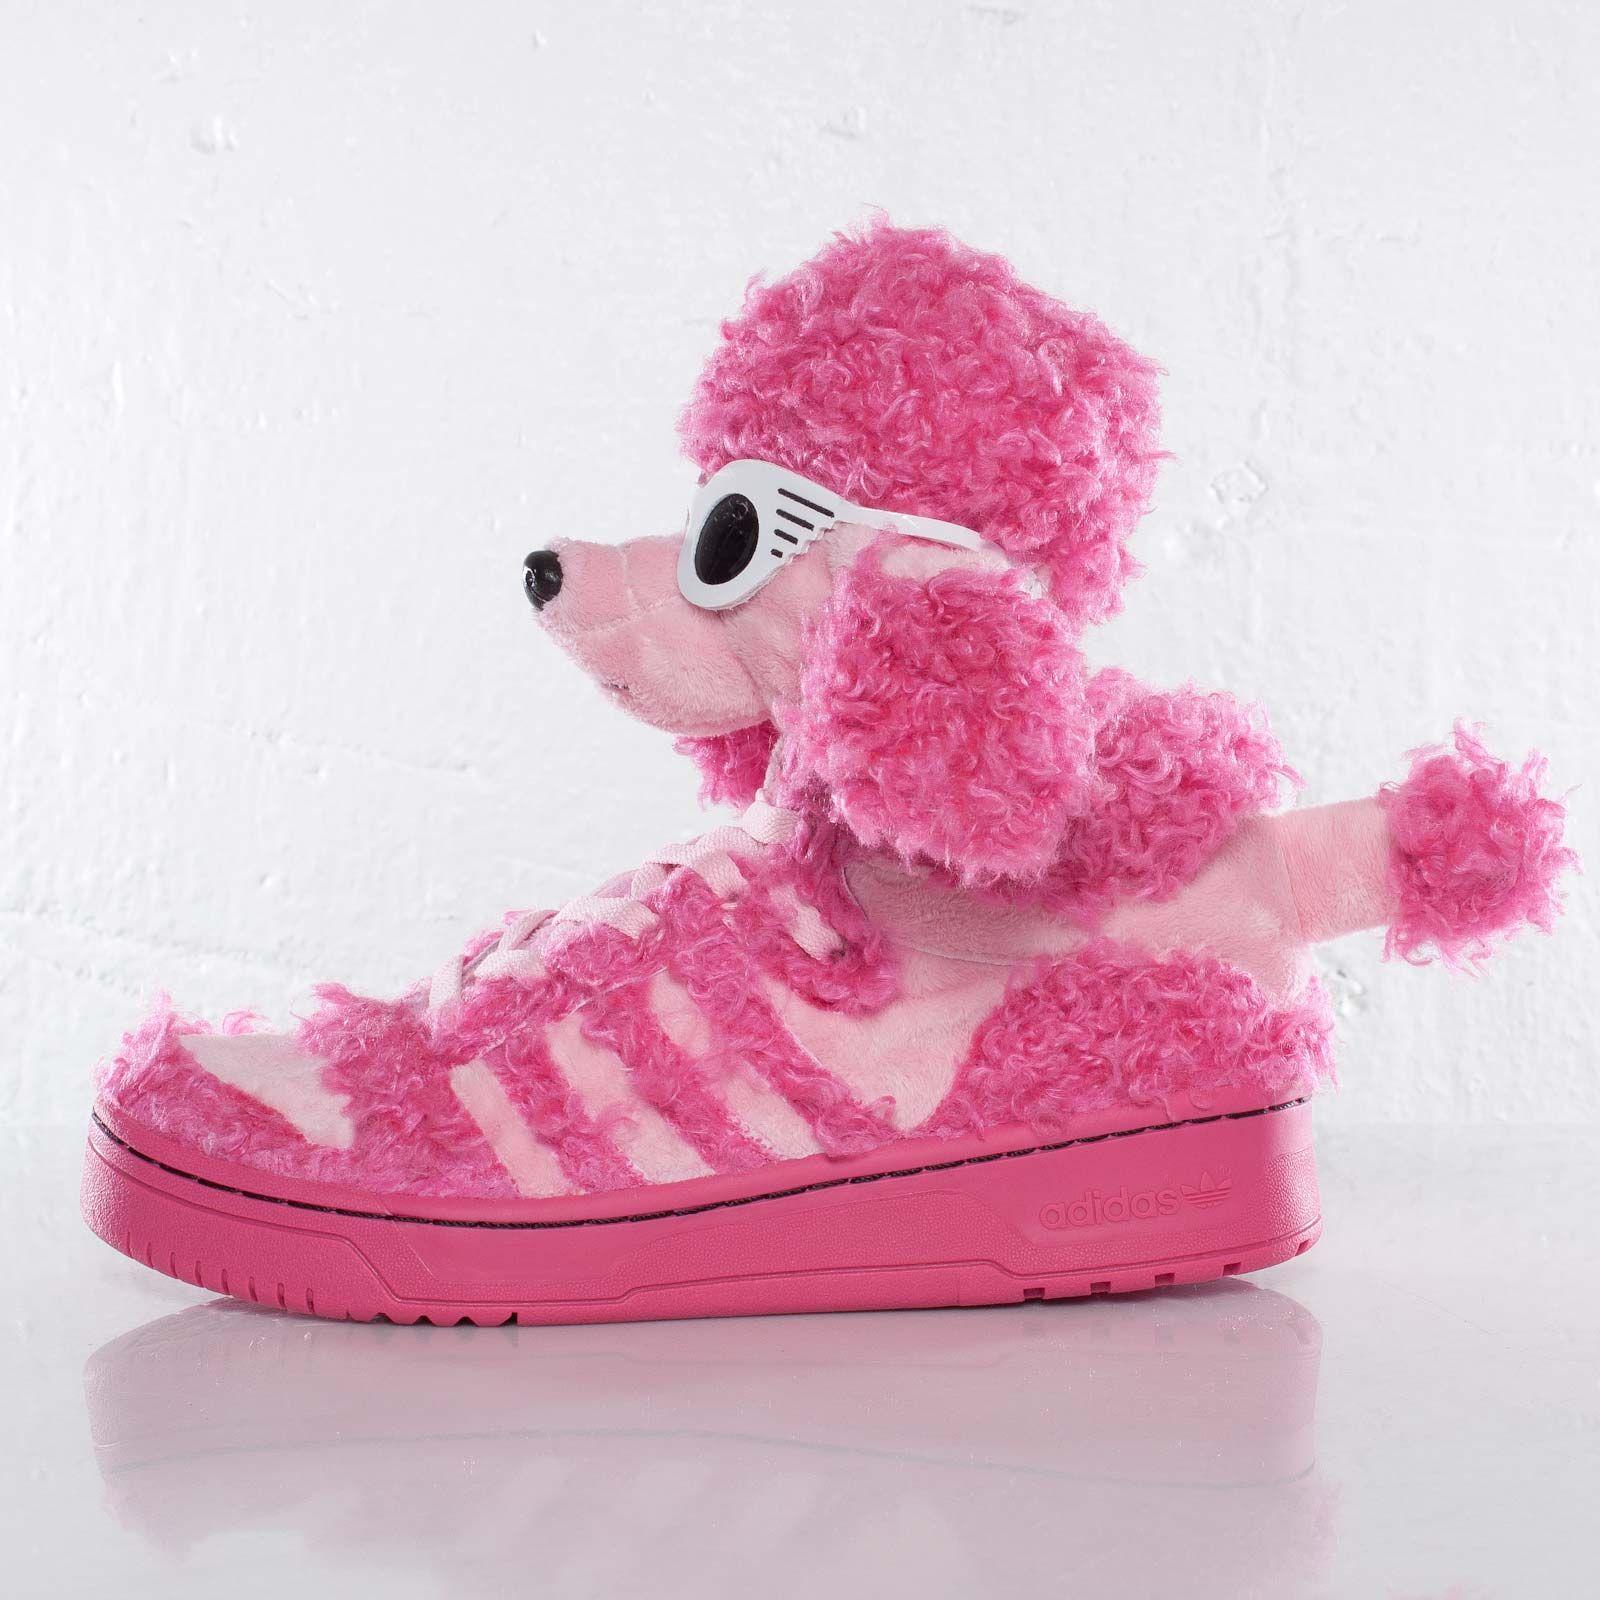 adidas Originals JS Poodle